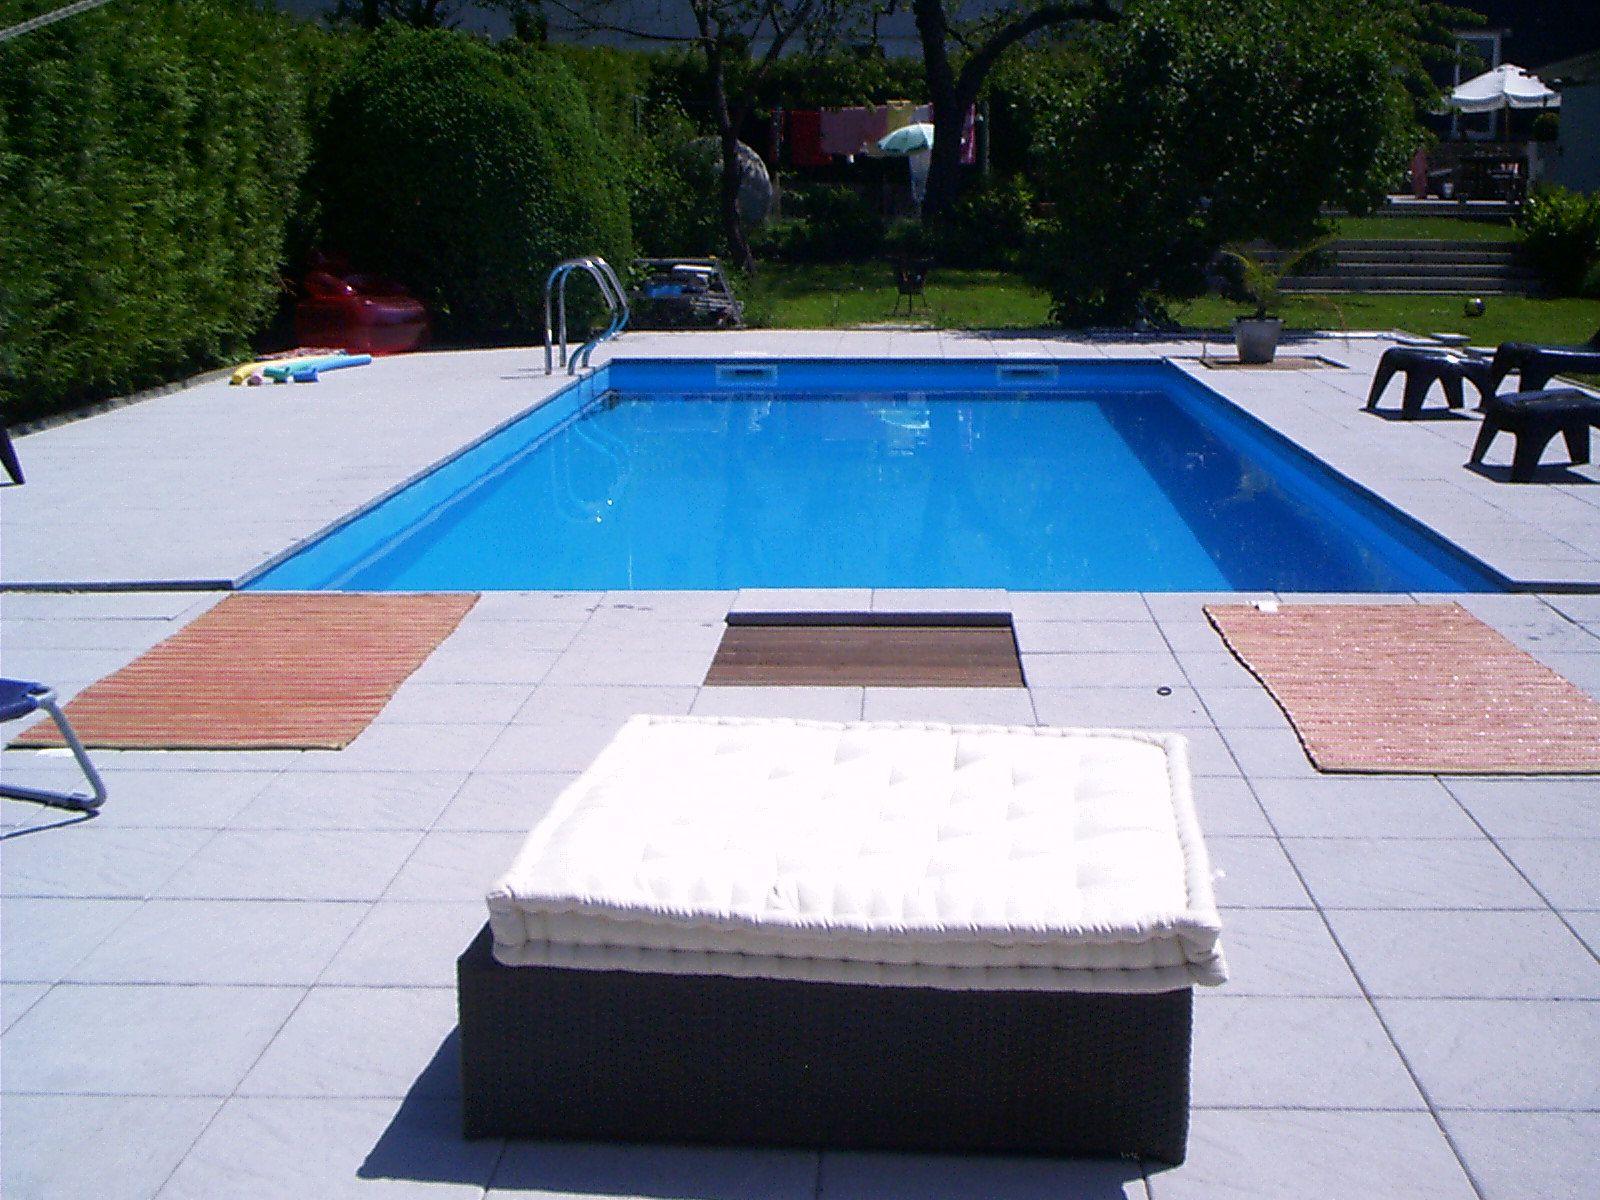 schwimmbad / aussenpool selber bauen bauanleitung zum selber bauen